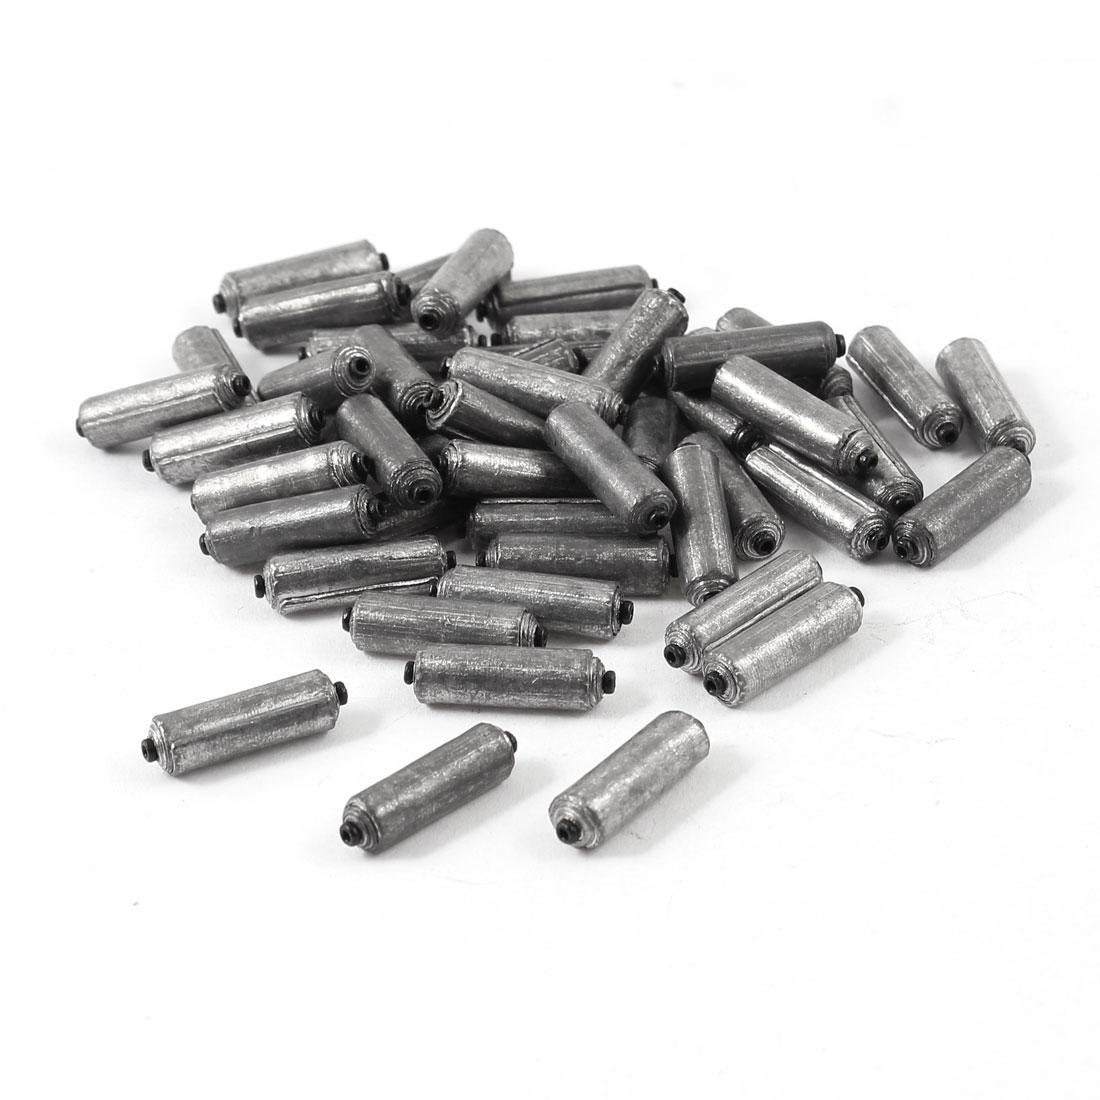 49pcs Cylinder Shape Lead Weight Split Shots Fishing Sinkers 19mm x 5mm 1.5g Per Piece